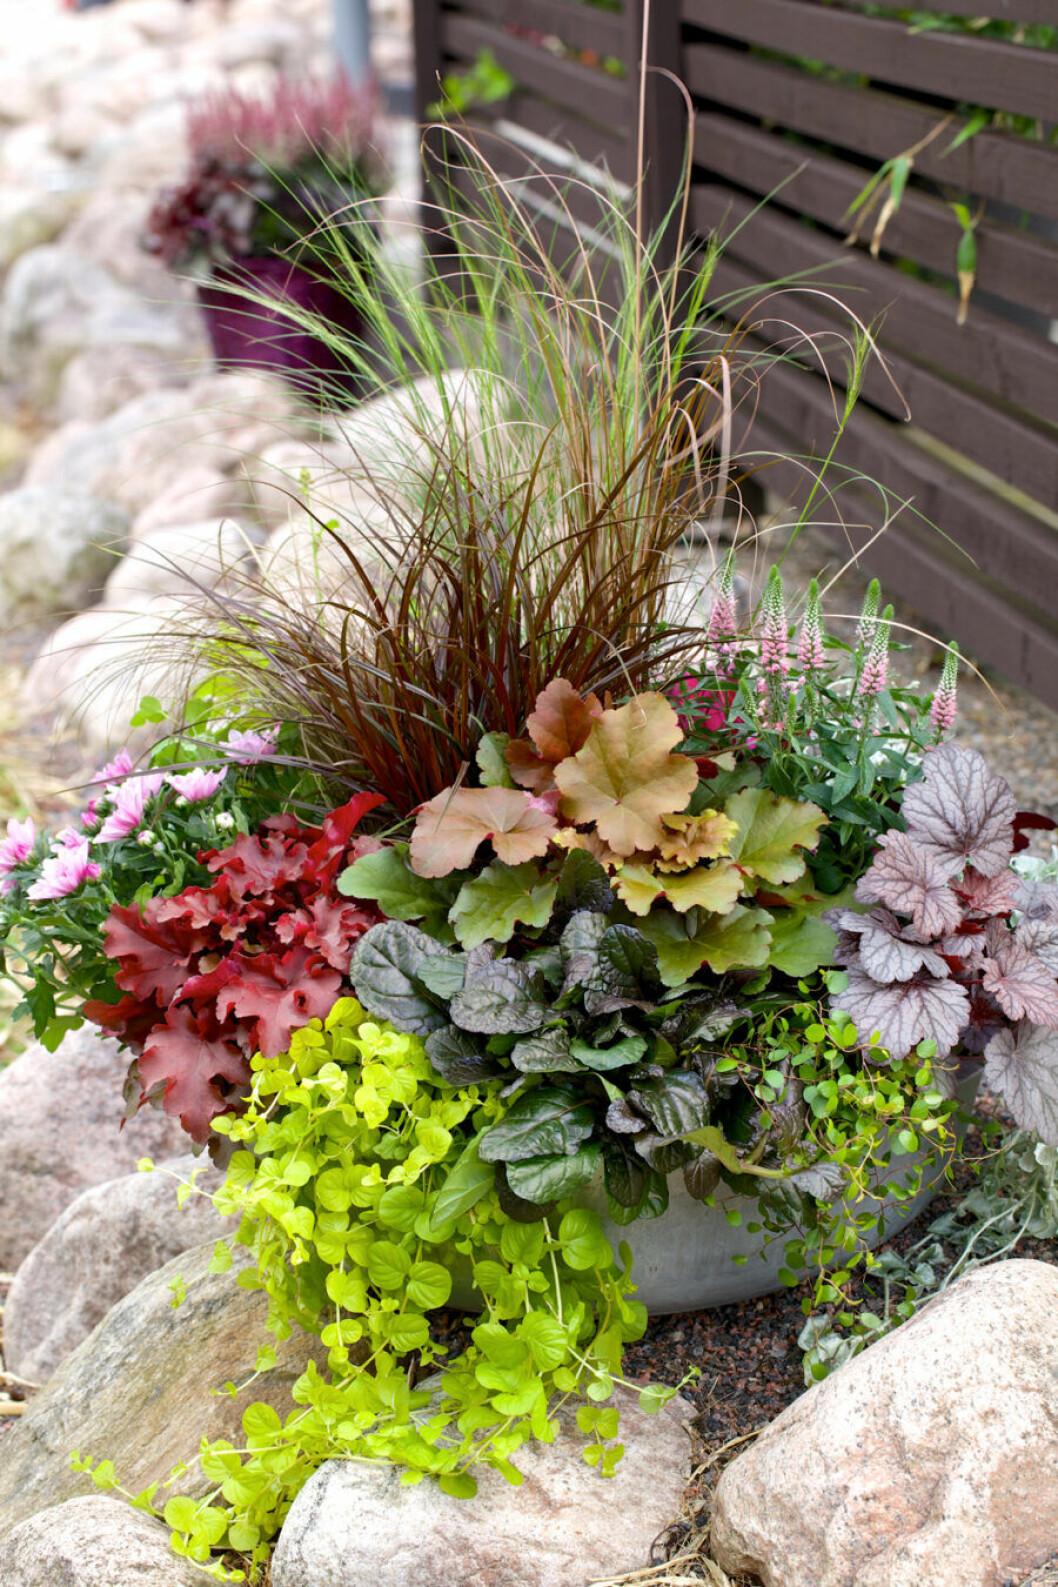 Plantering Blomsterlandet